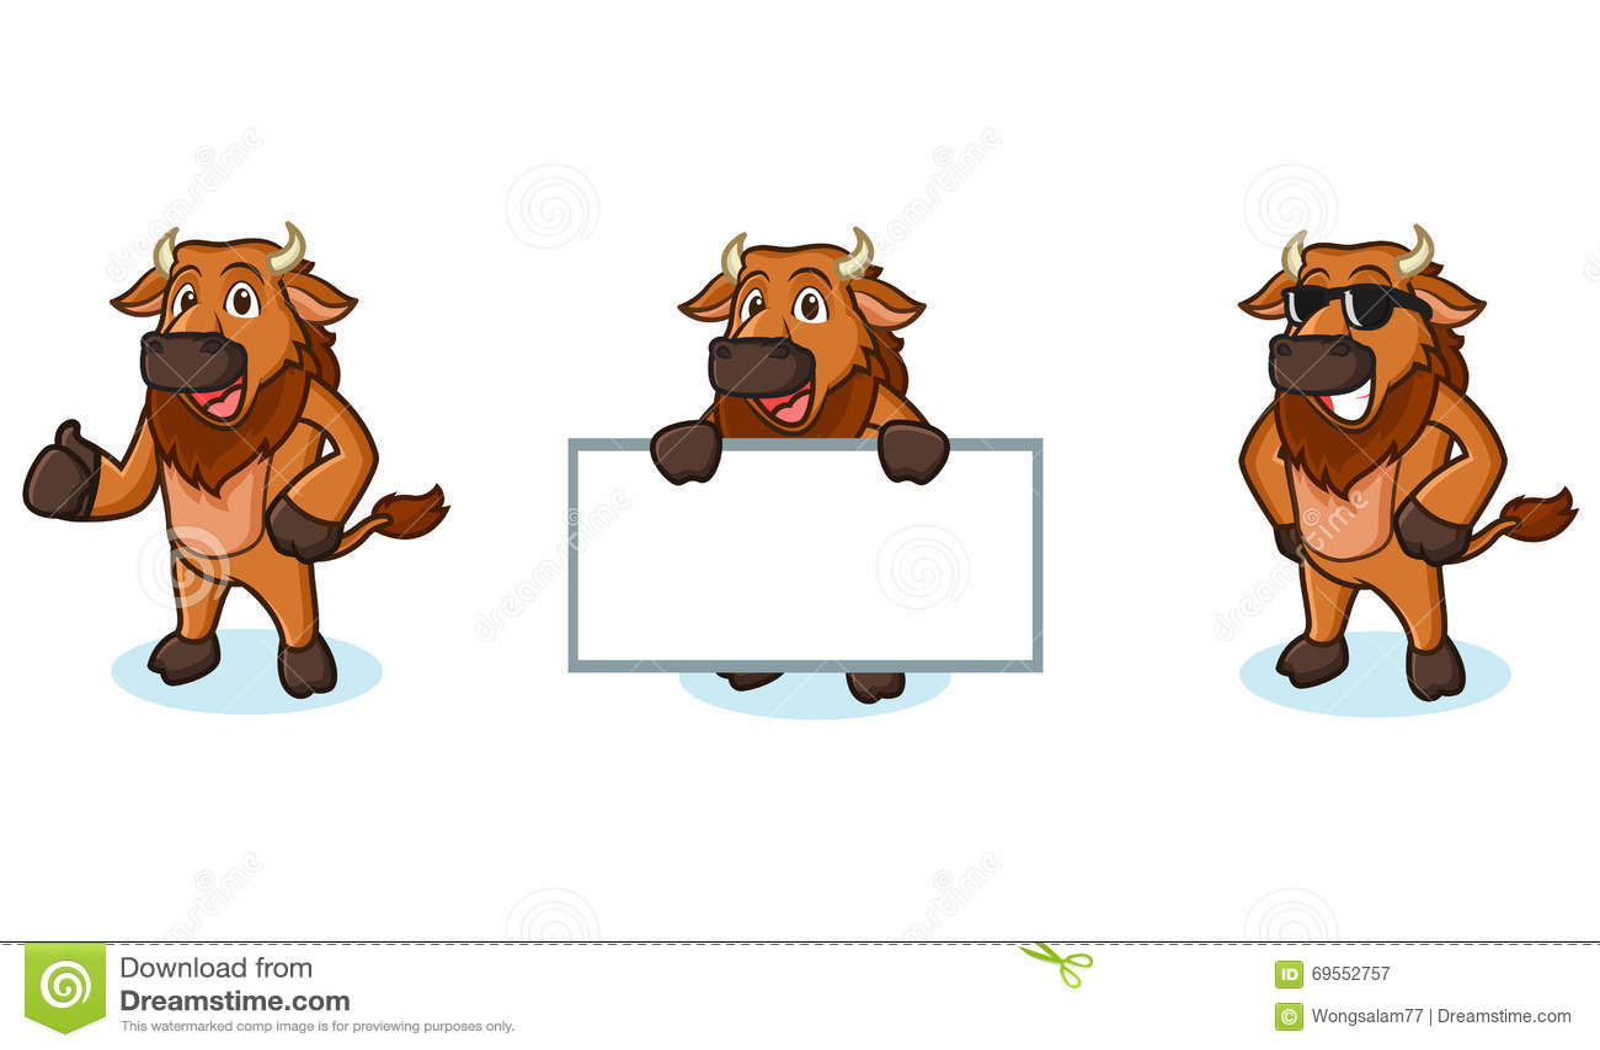 Bison mascot clipart - photo#18